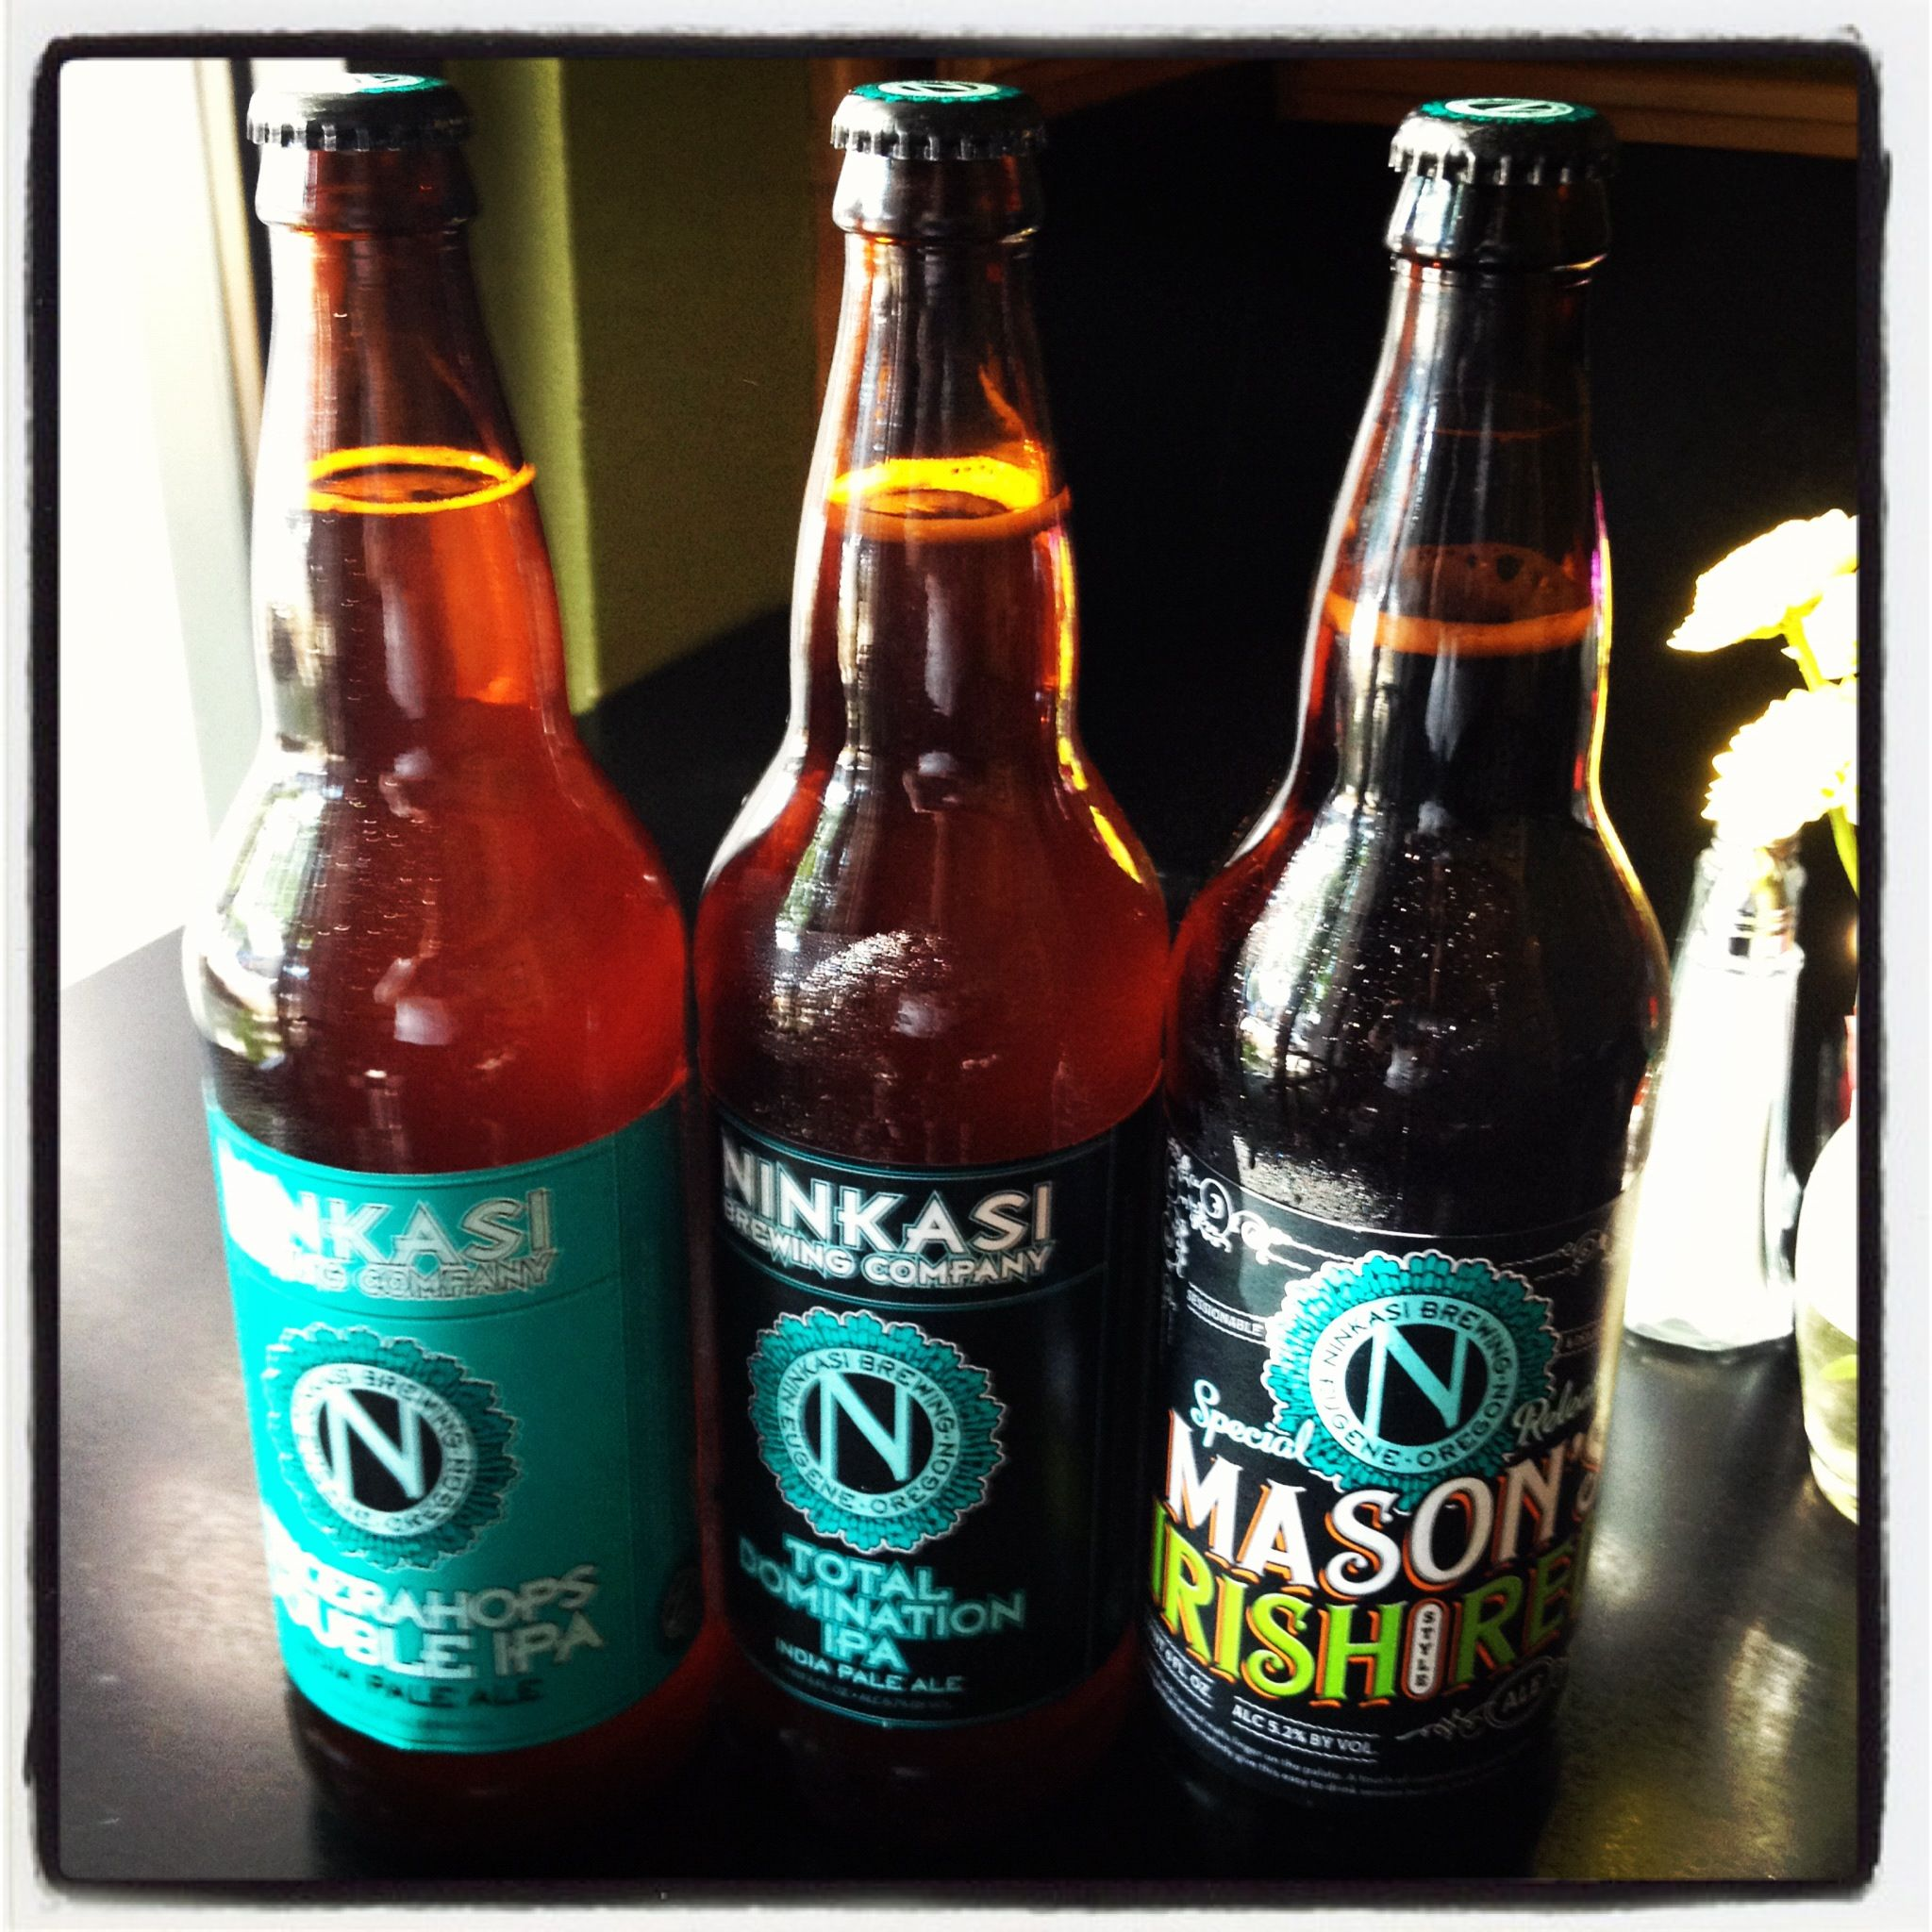 Ninkasi Brewing Oregon Craft Beers Craft Beer Wine And Beer Beer